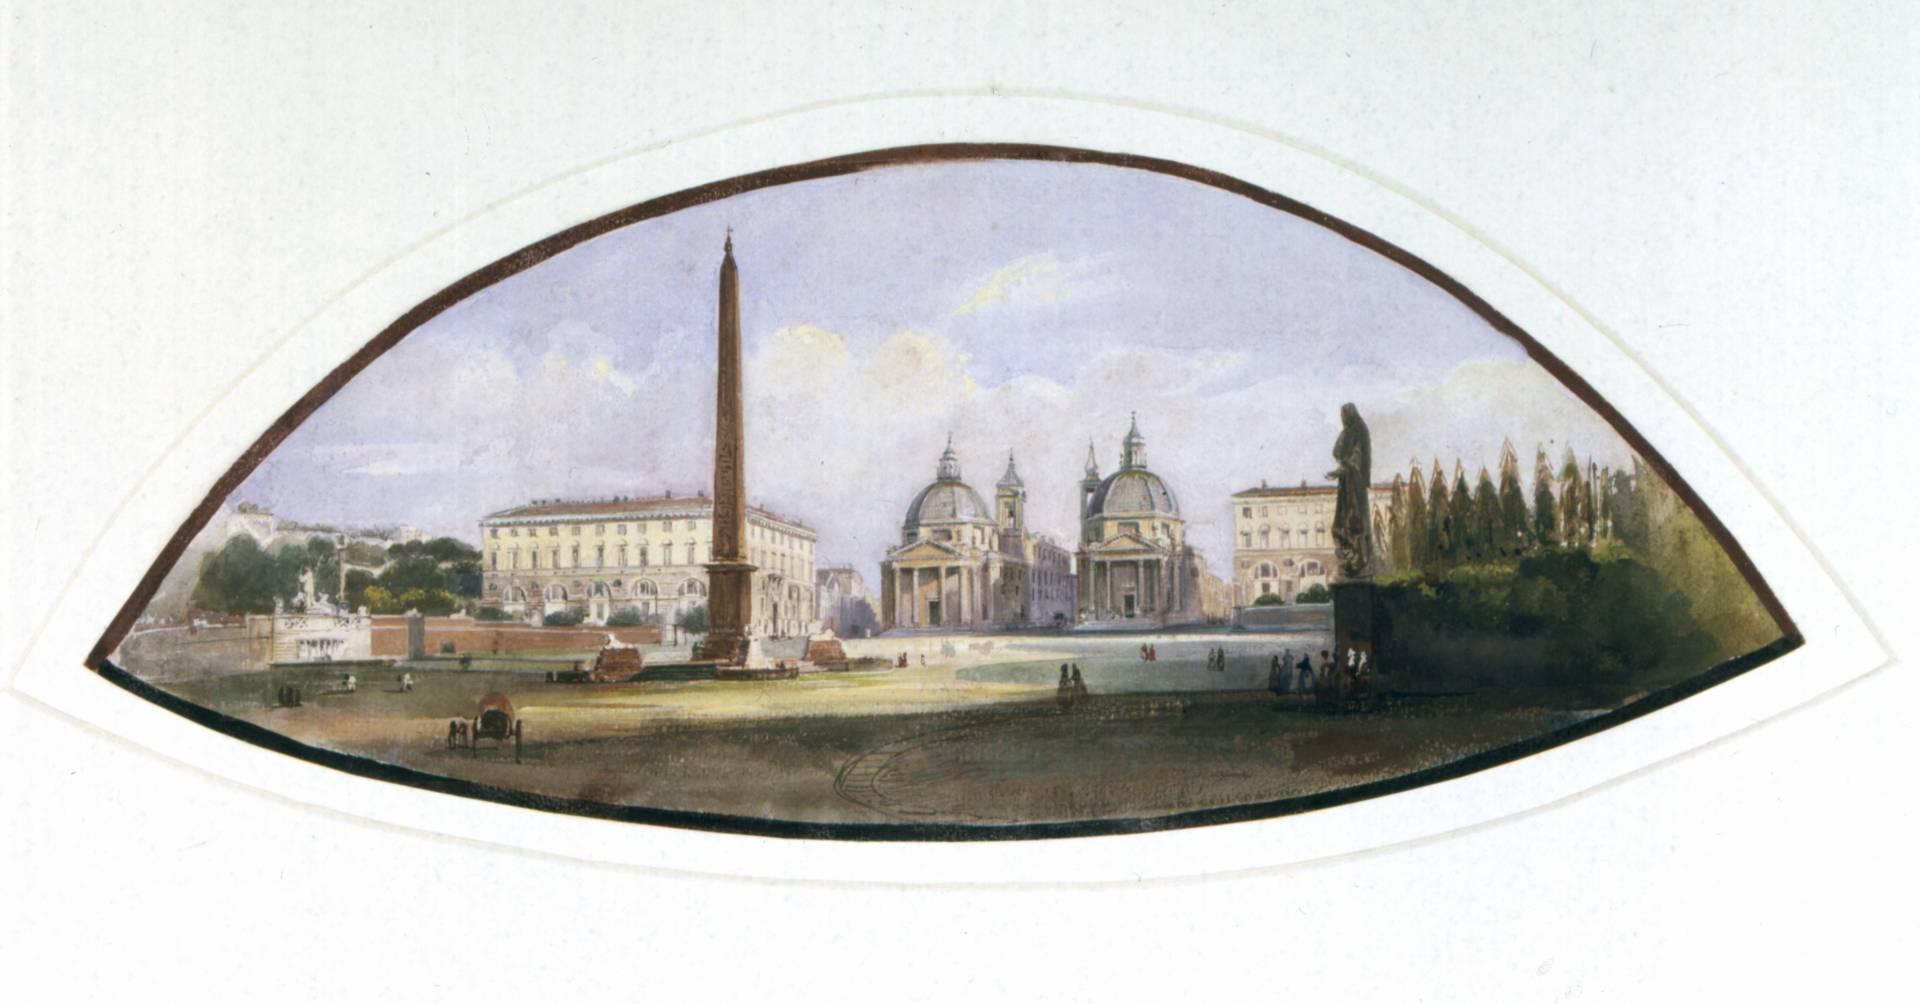 Acuarela de la Plaza Del Popolo, de Ippolito Caffi (1843-1857).